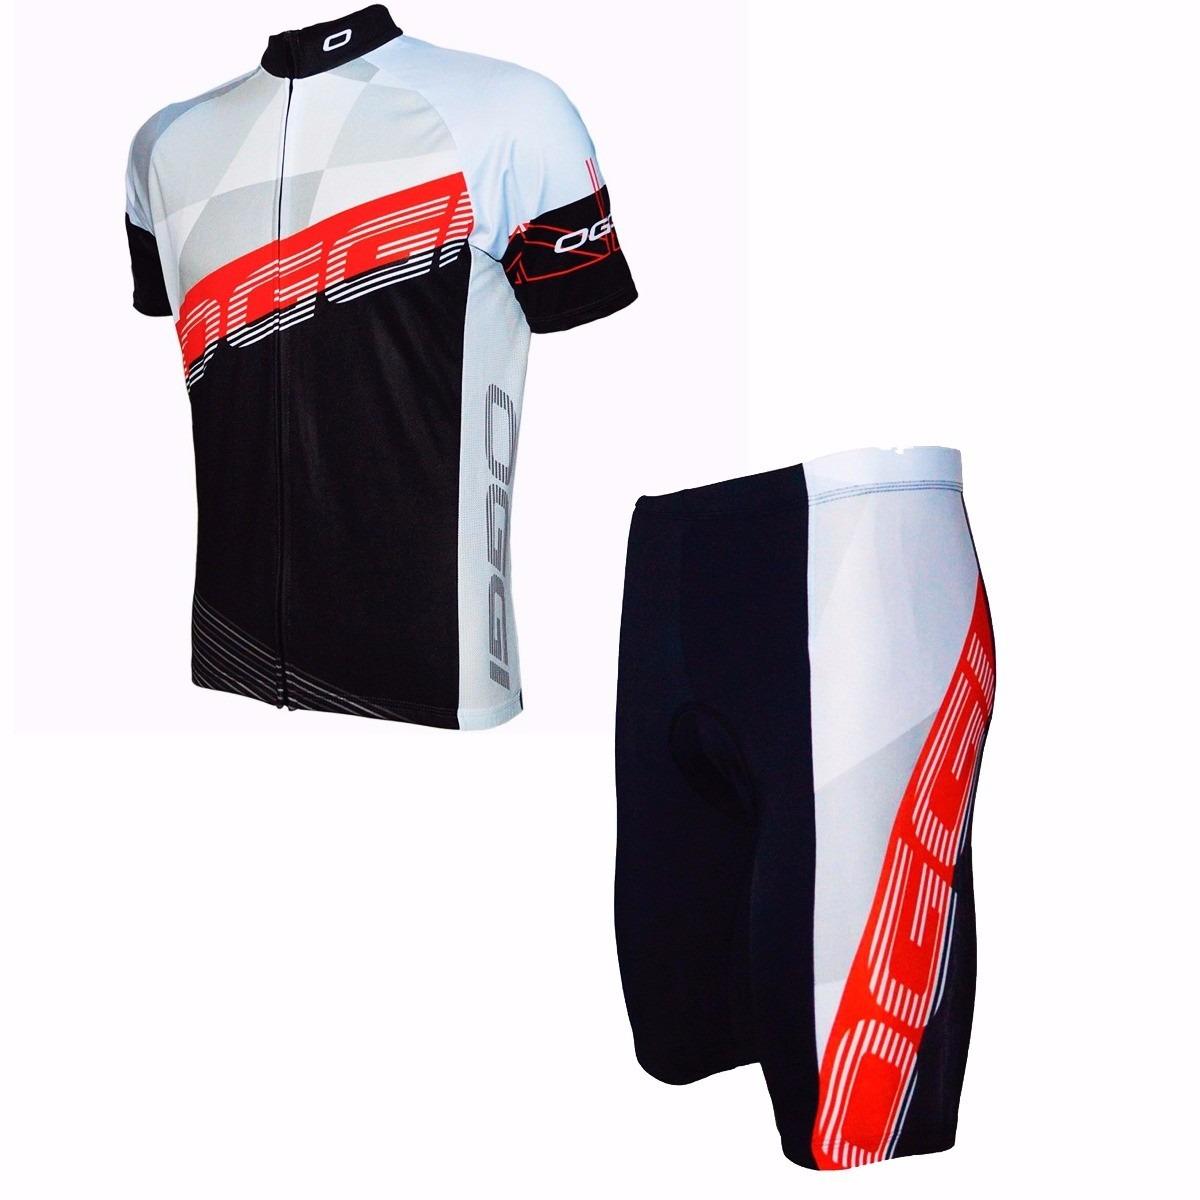 Conjunto Uniforme Ciclismo Oggi Hacker Camisa + Bermuda Bike - R ... 1224b977cdfd5